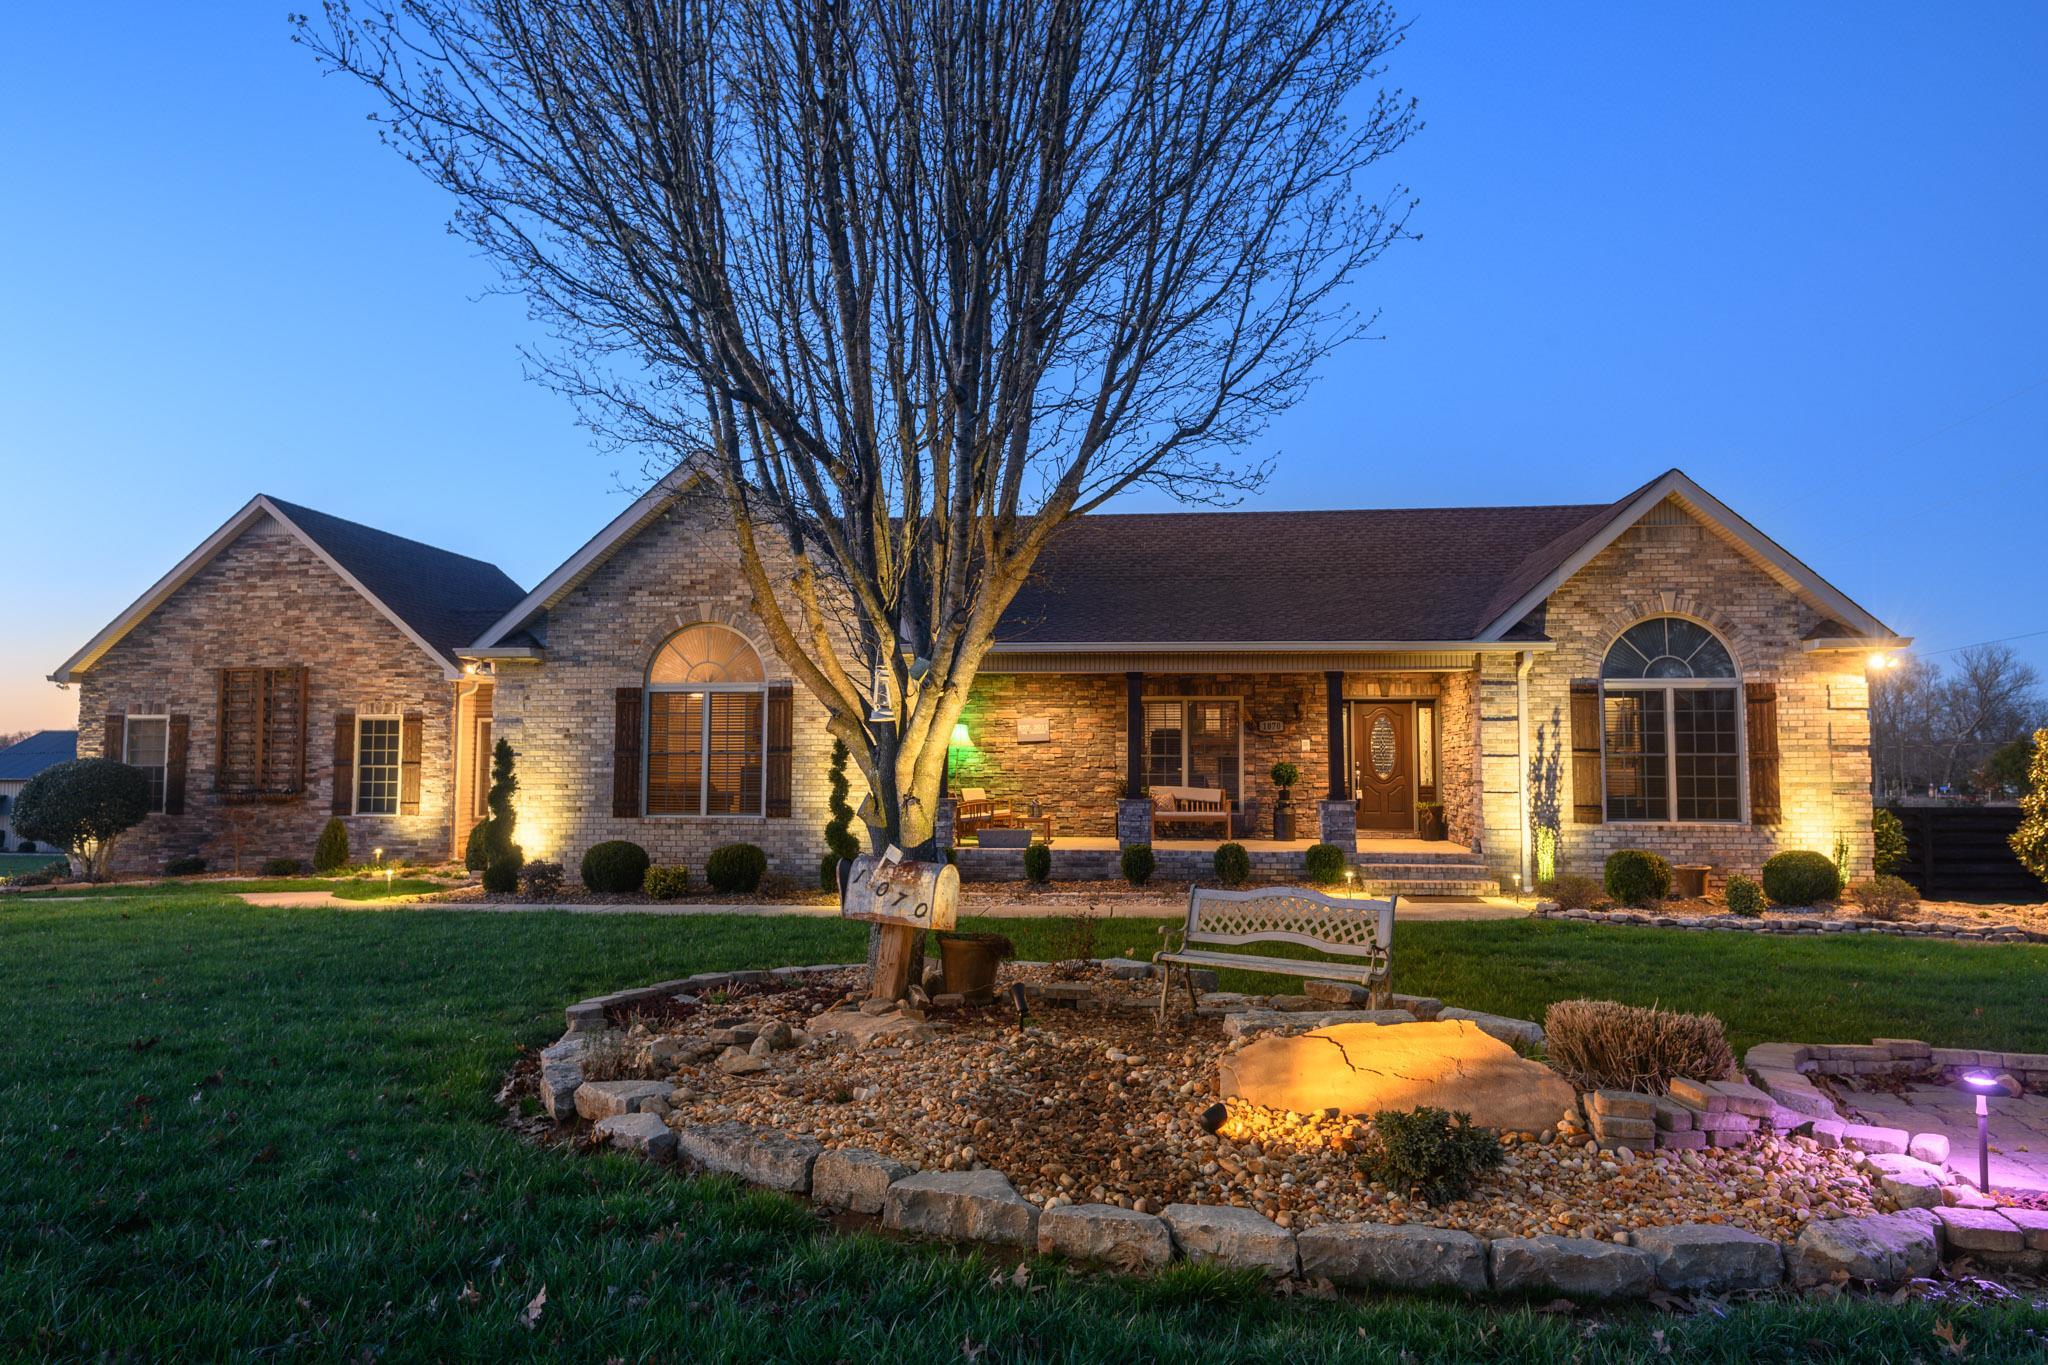 1070 Frank Martin Rd, Shelbyville, TN 37160 - Shelbyville, TN real estate listing